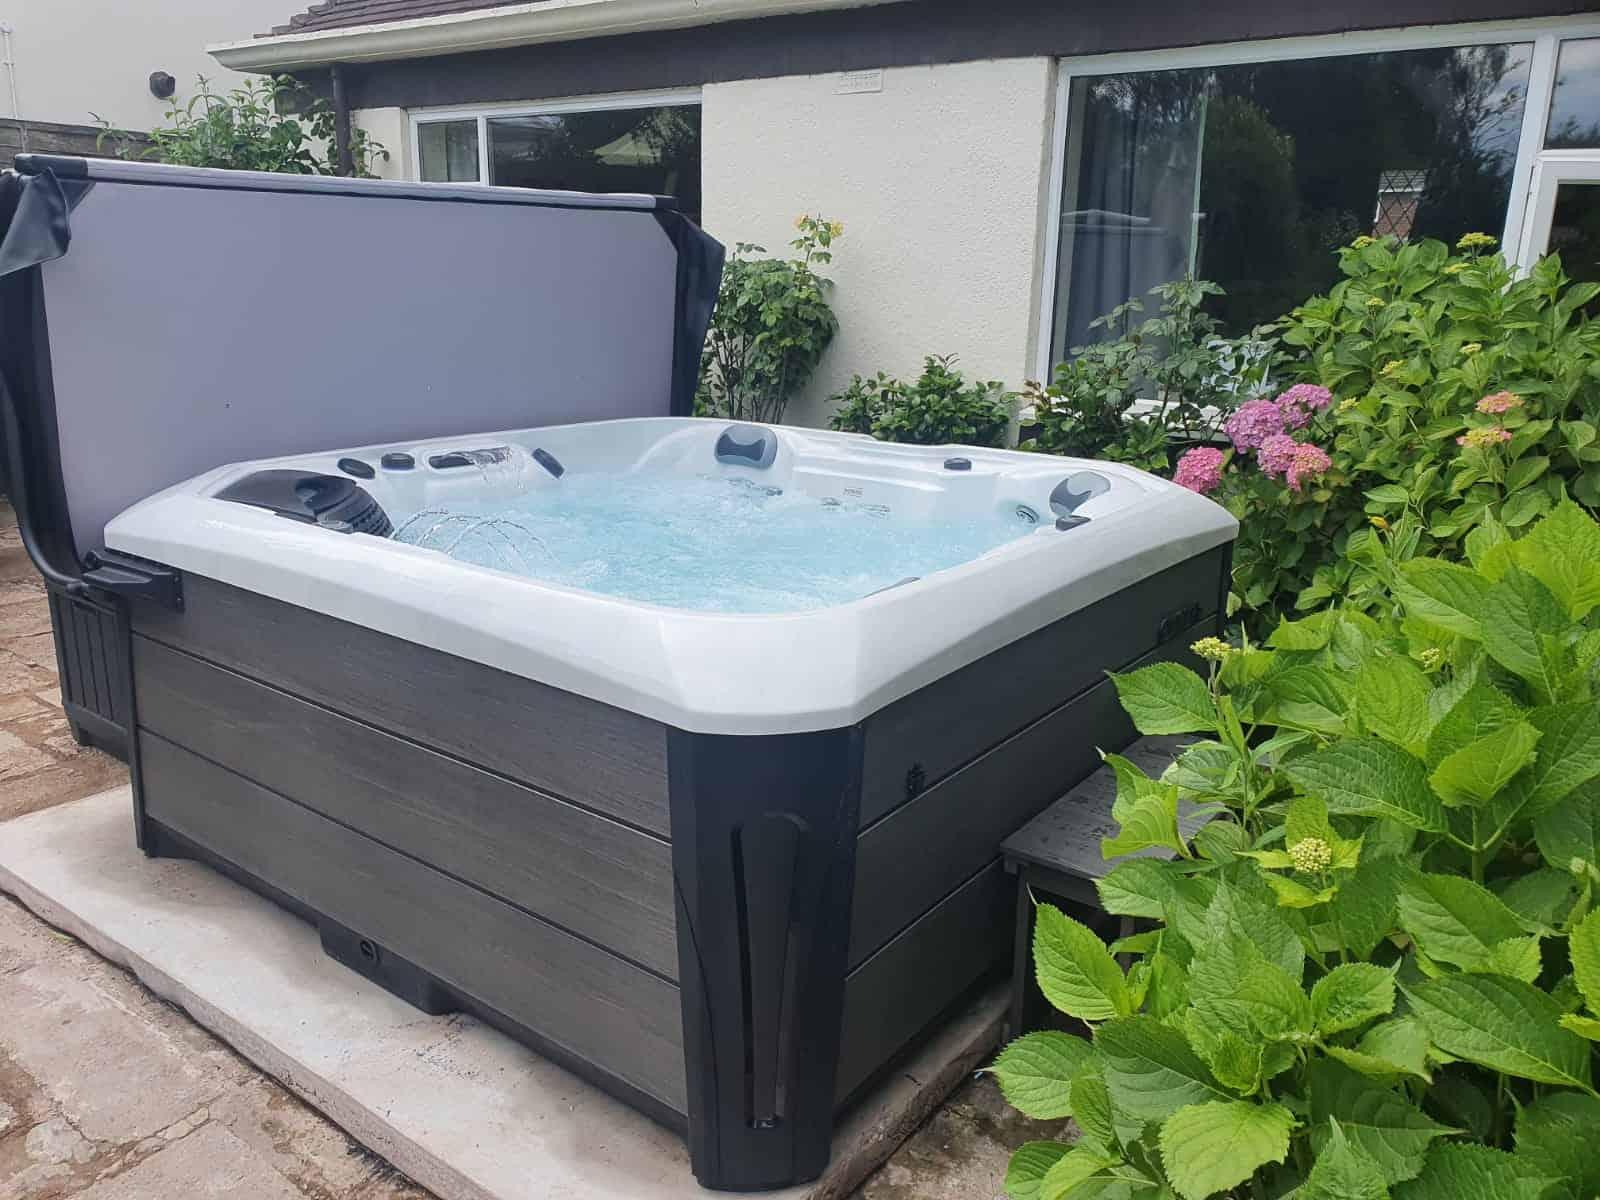 Kenya Hot Tub review